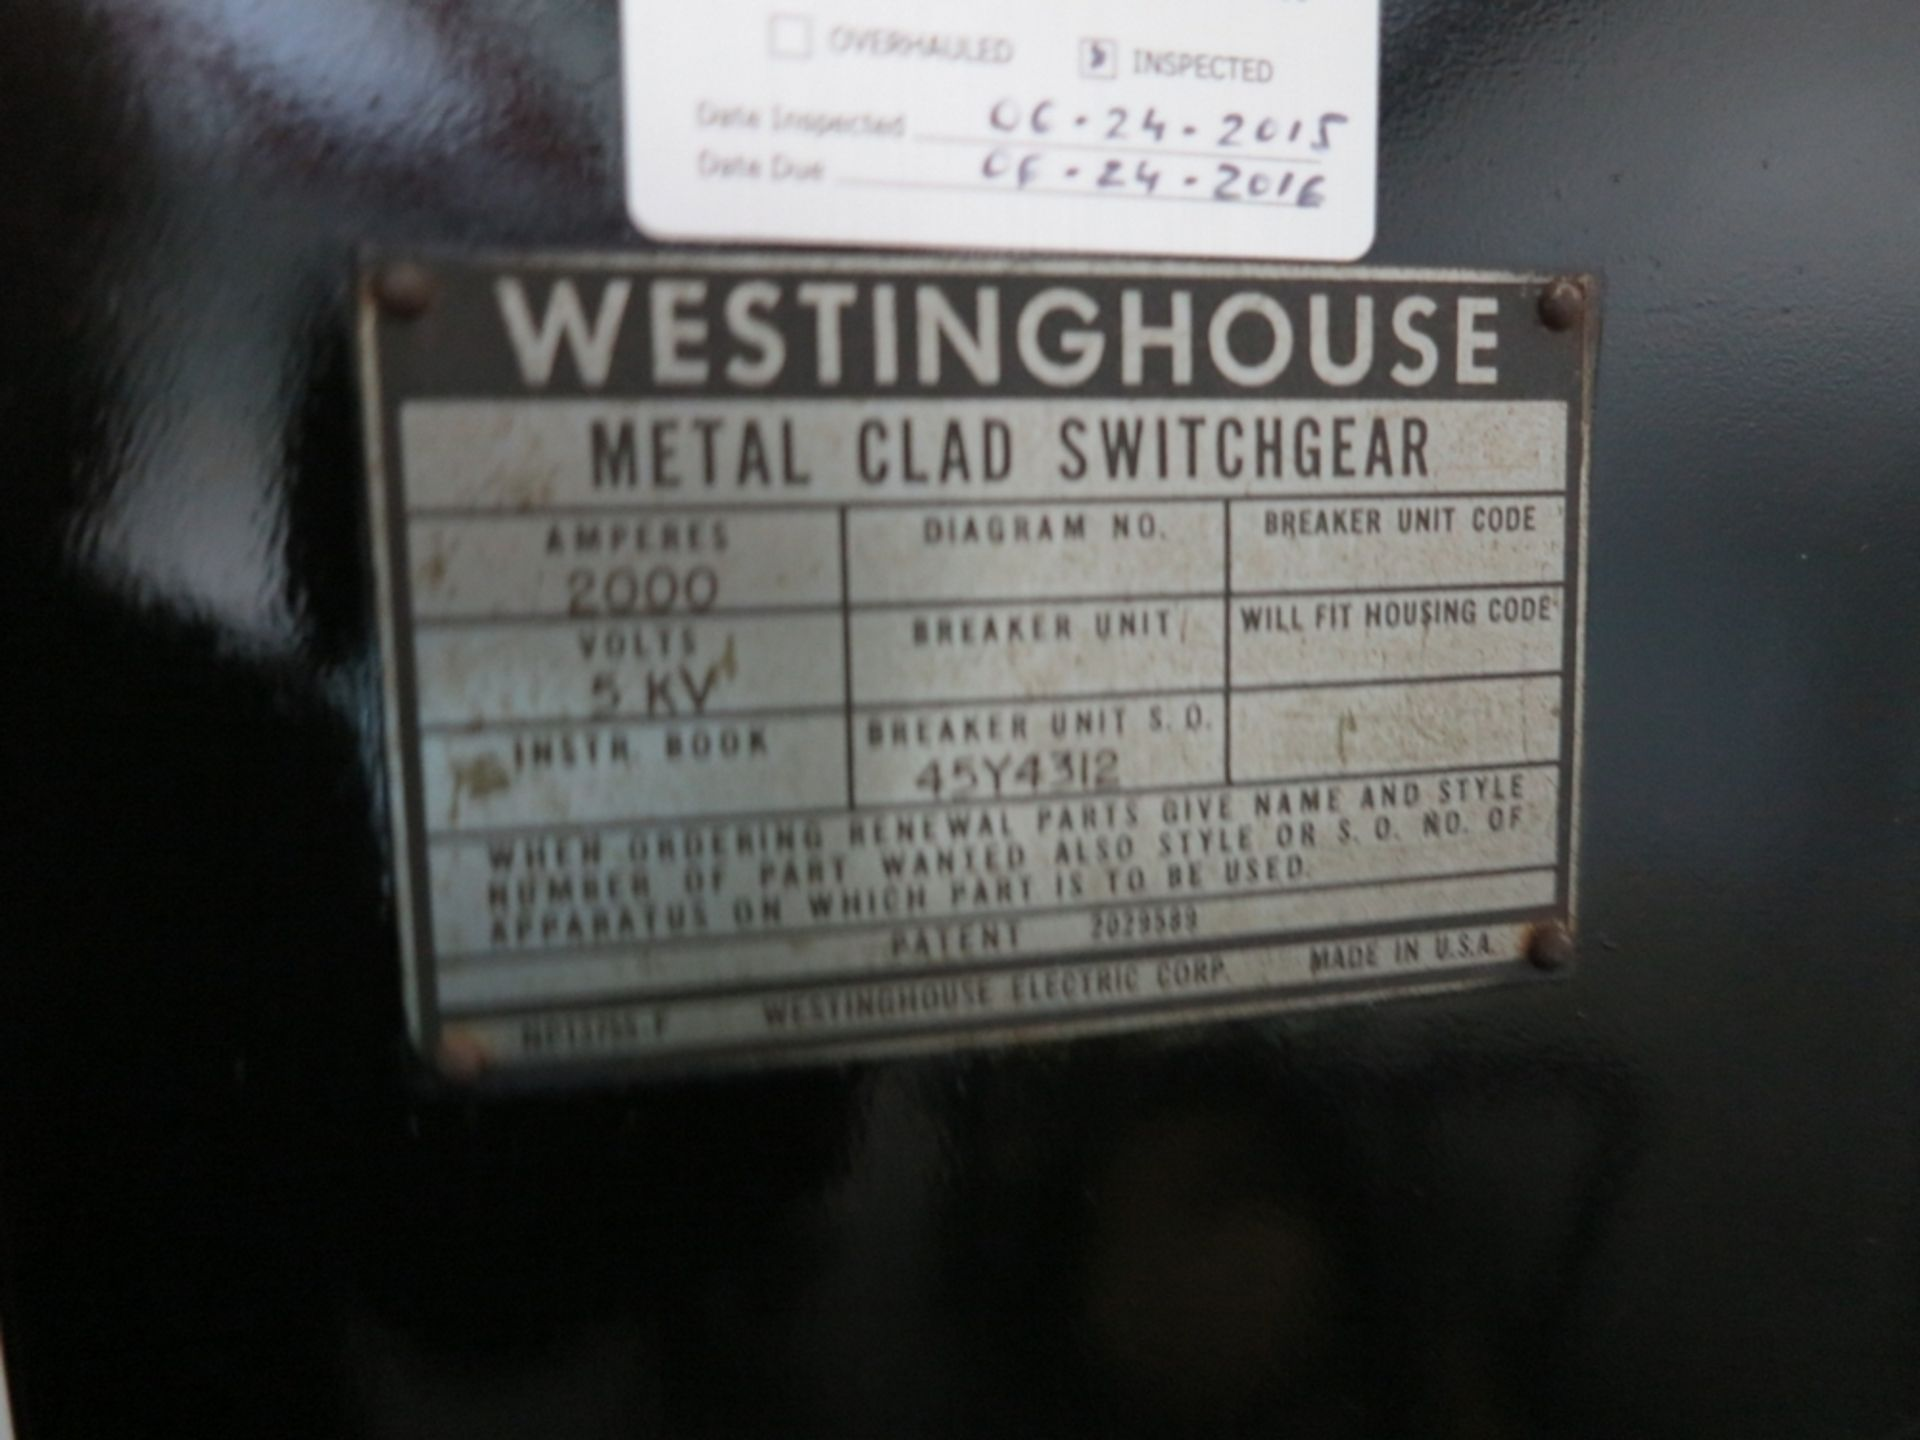 Lot 473 - WESTINGHOUSE SWITCHGEAR, 2000 A, 5 KV